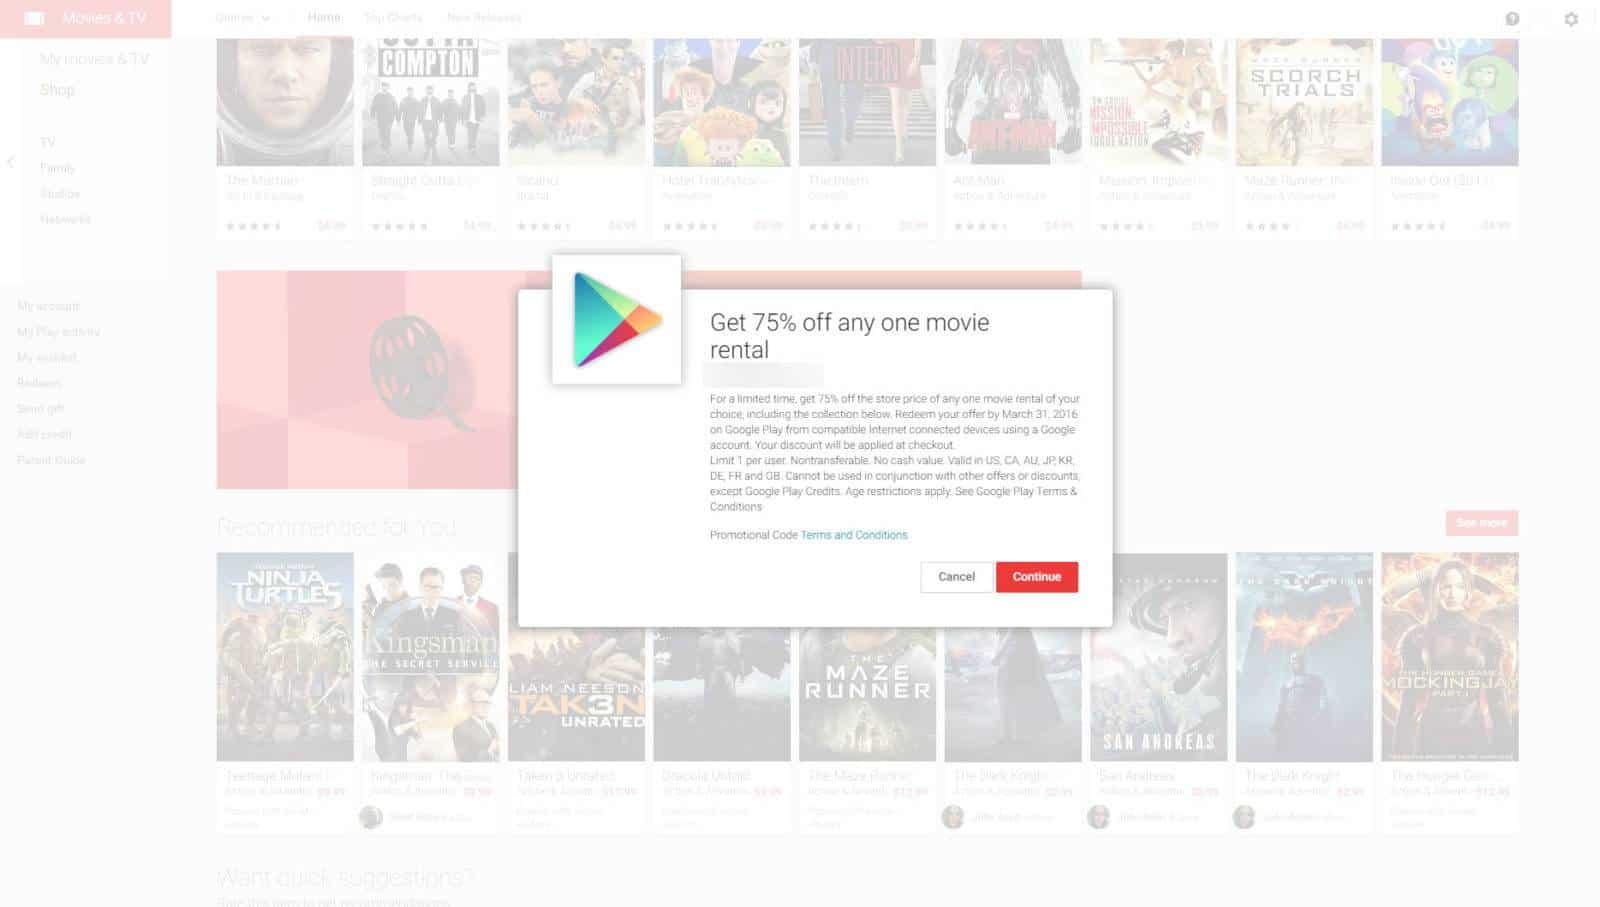 Google-play-movie-rental-coupon